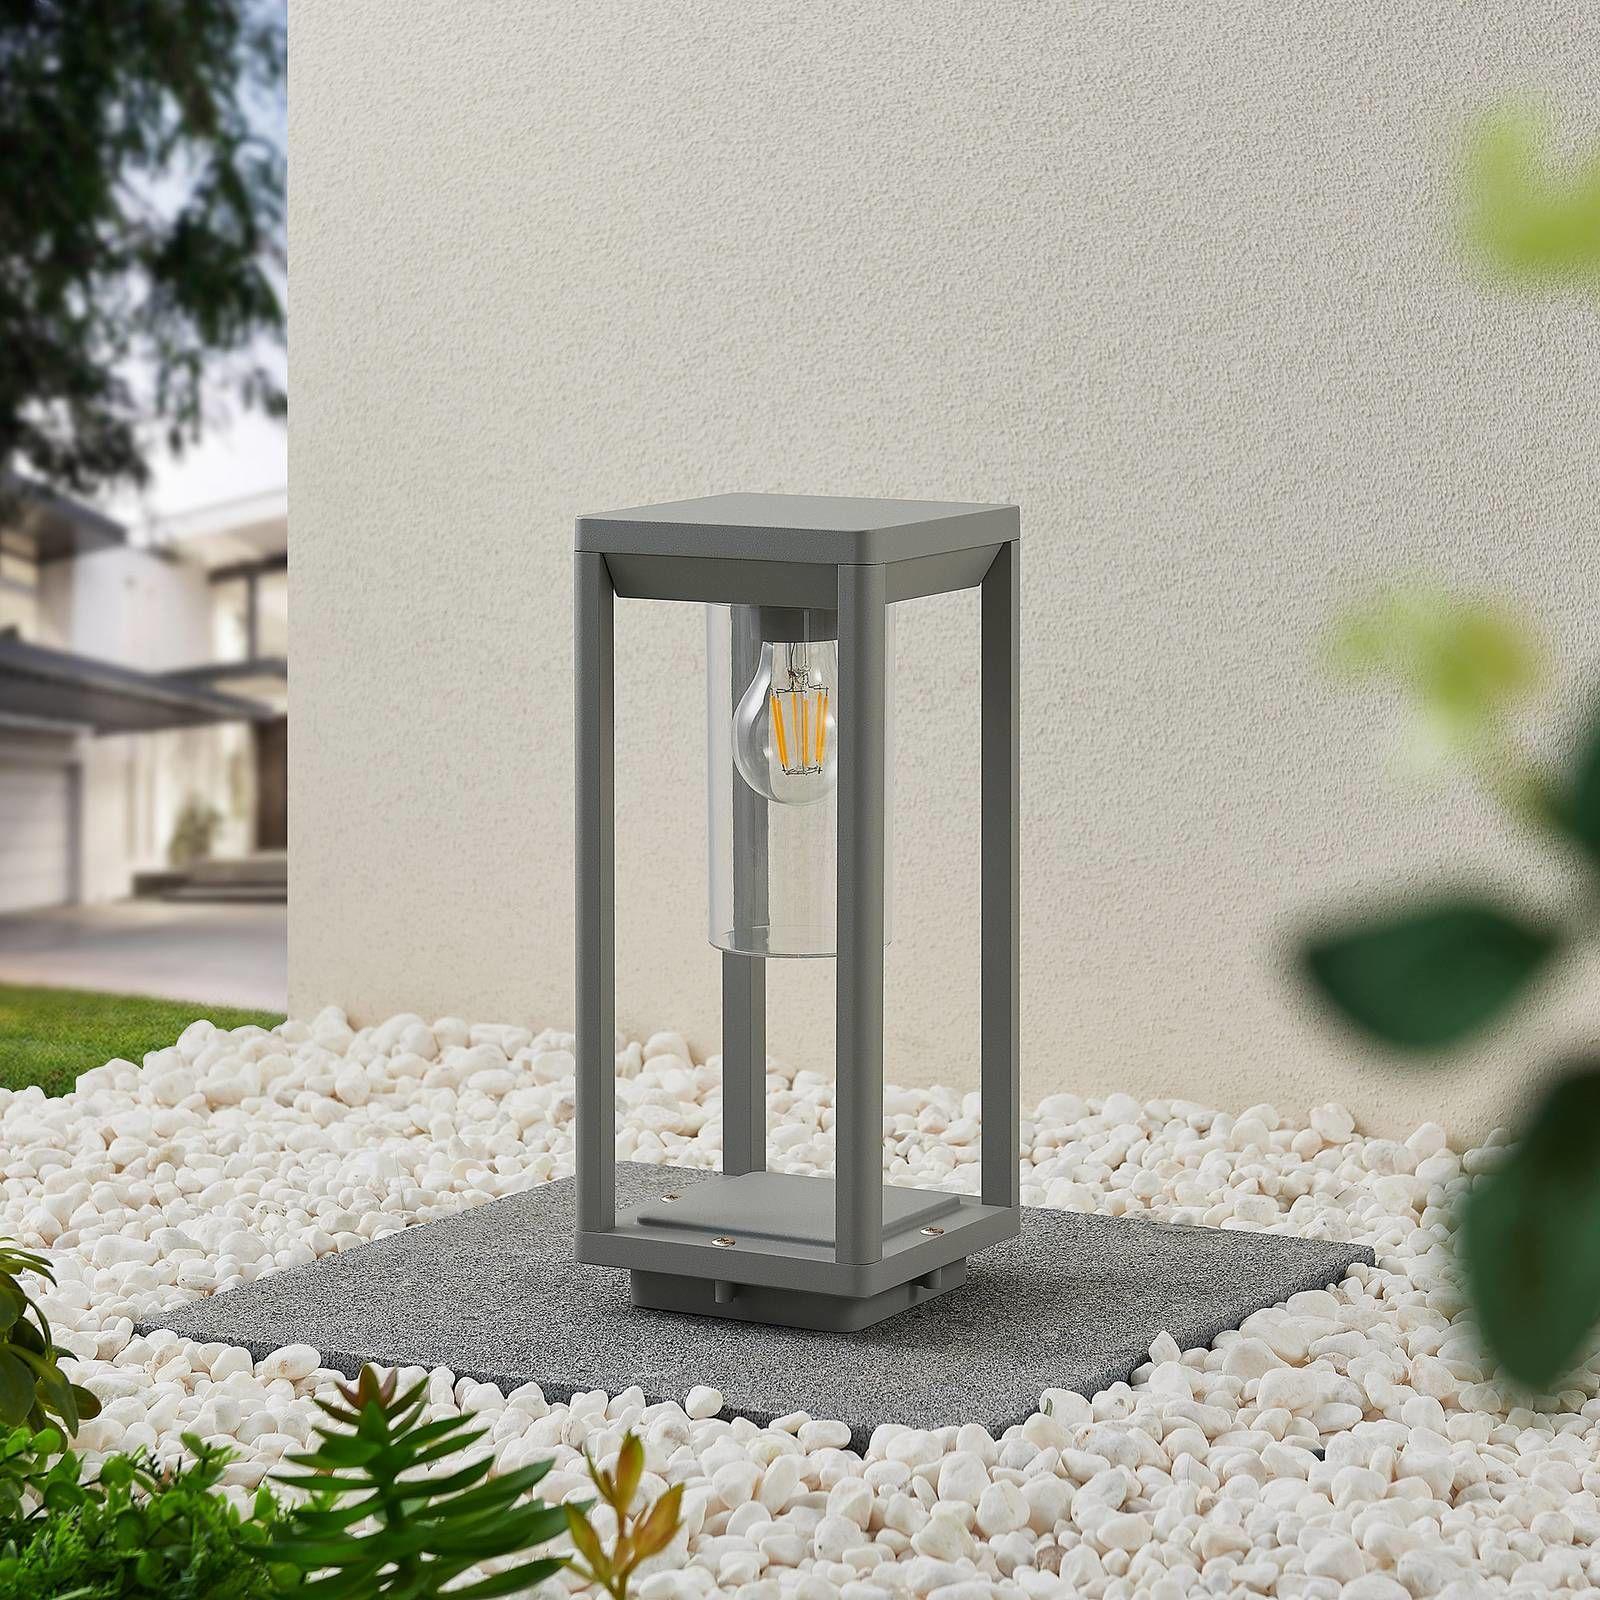 Lindby Estami lampa cokołowa 35 cm, srebrnoszara